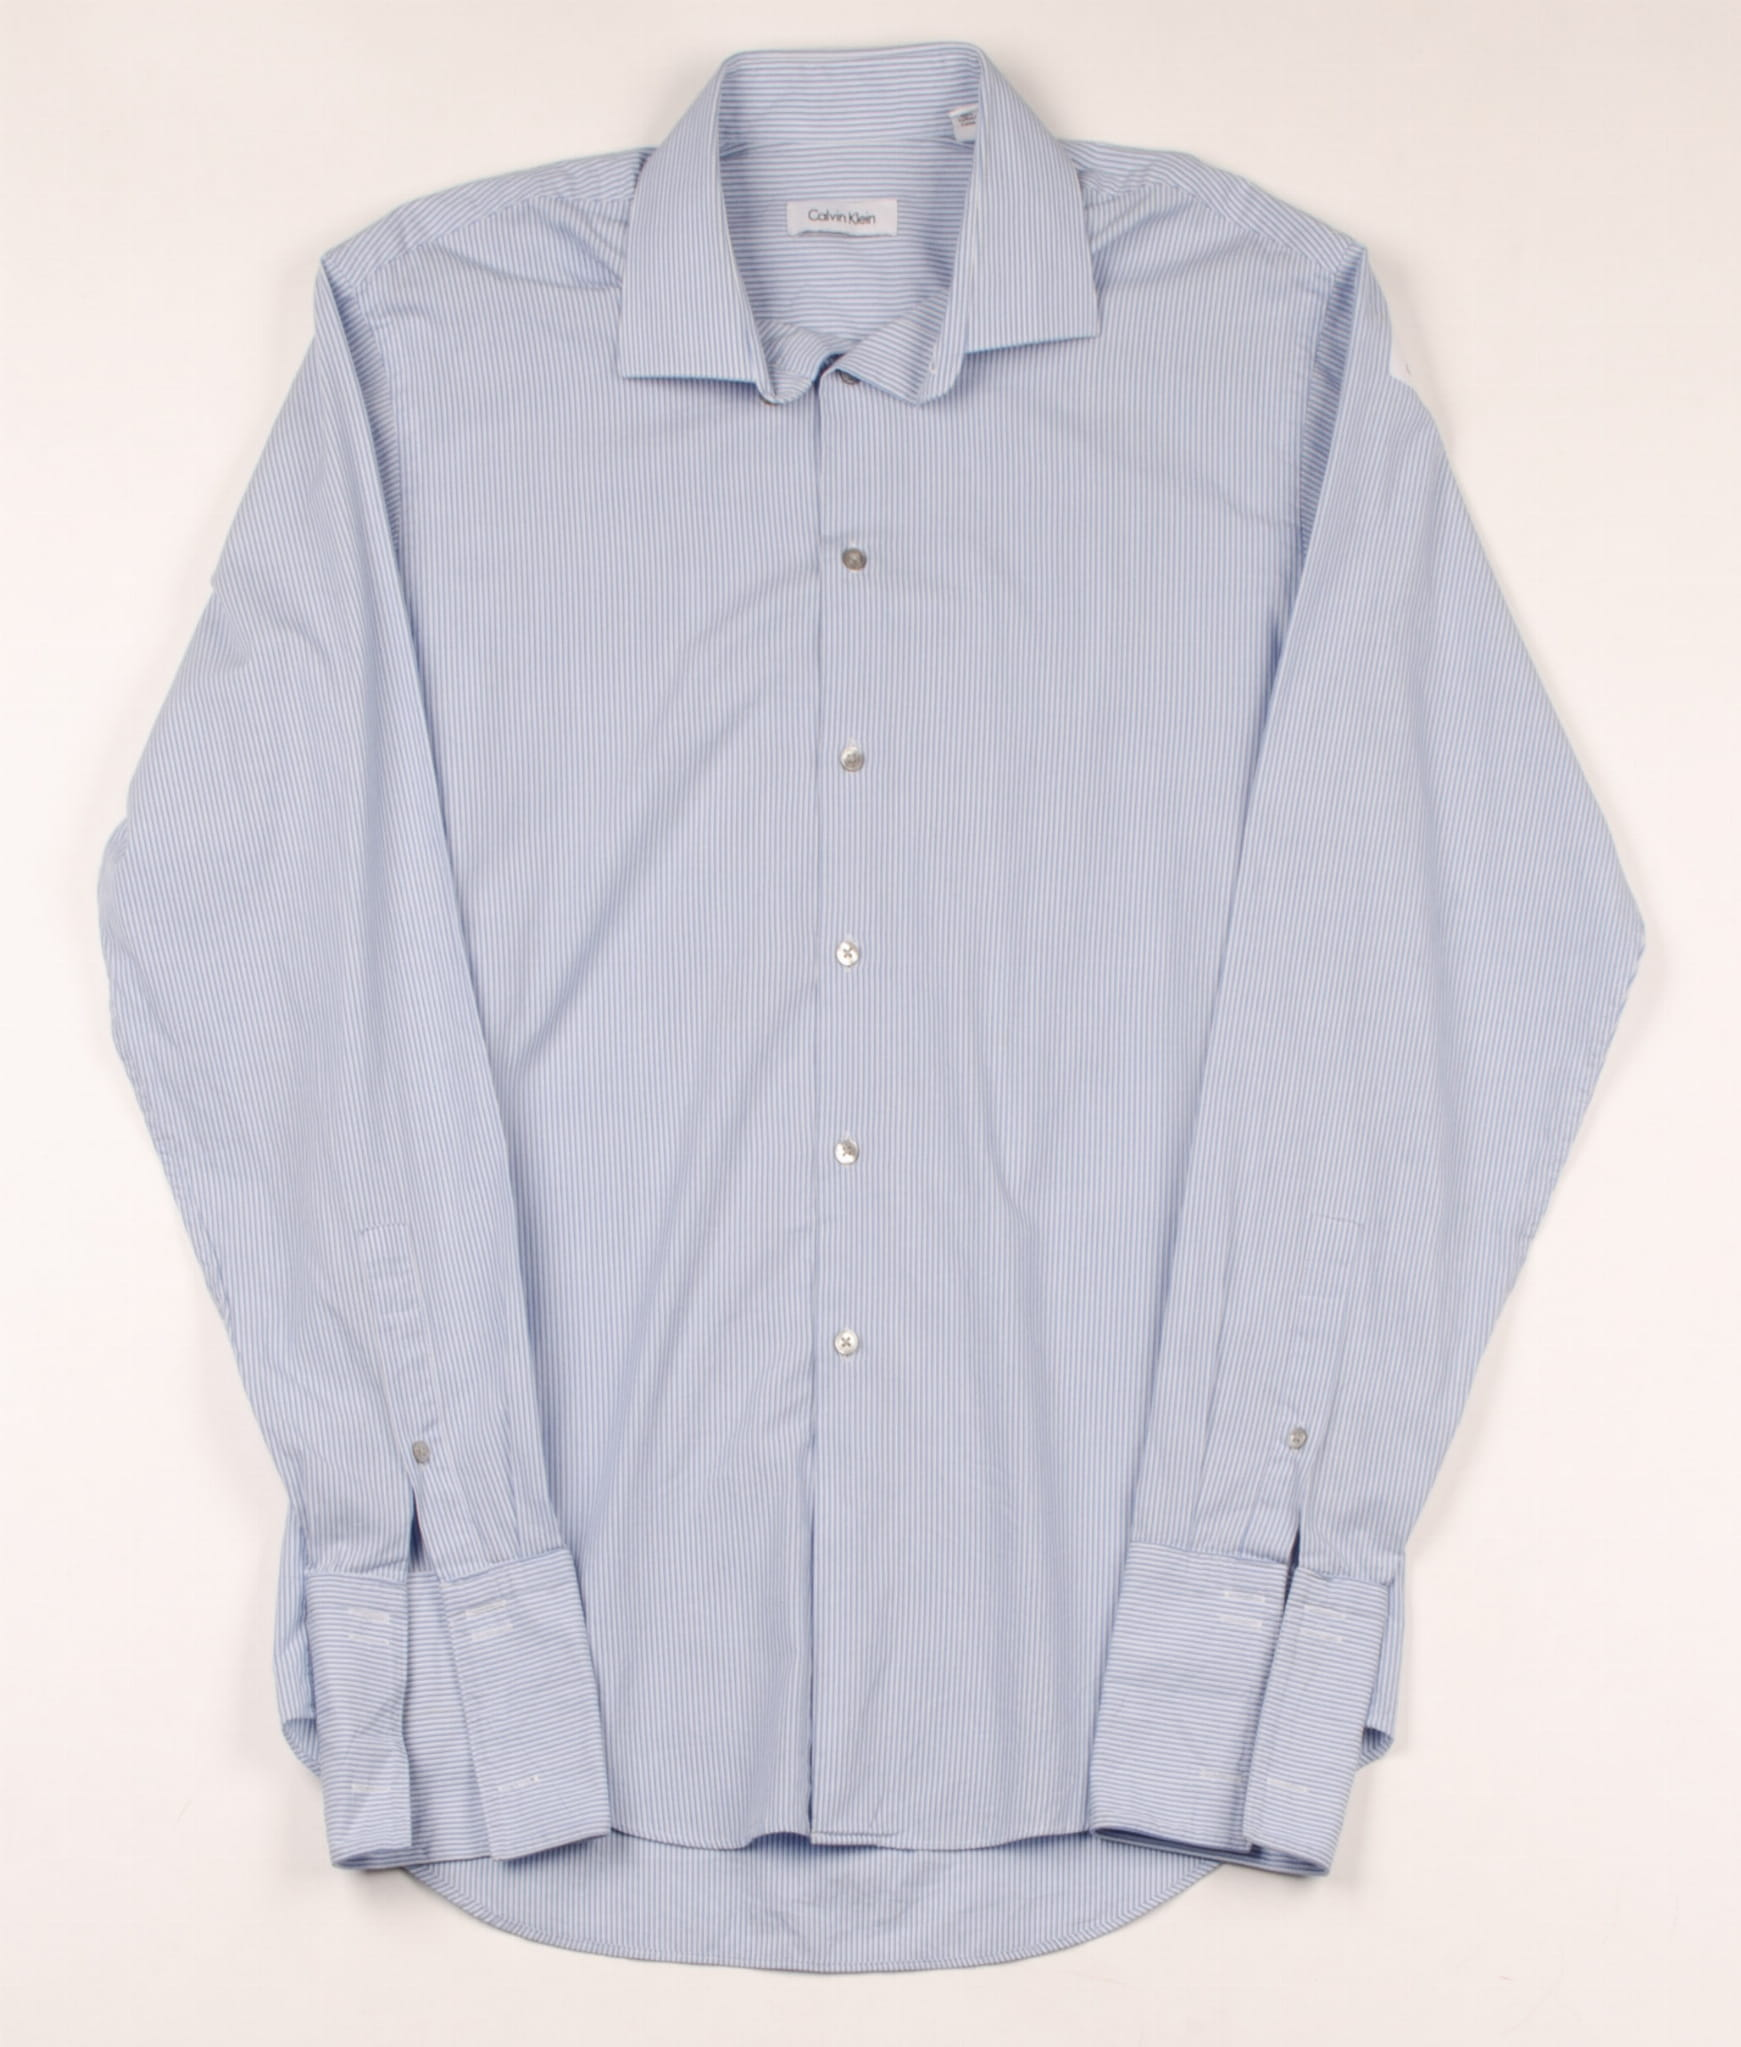 36828 Pranie Calvin Klein Koszula Męska XL